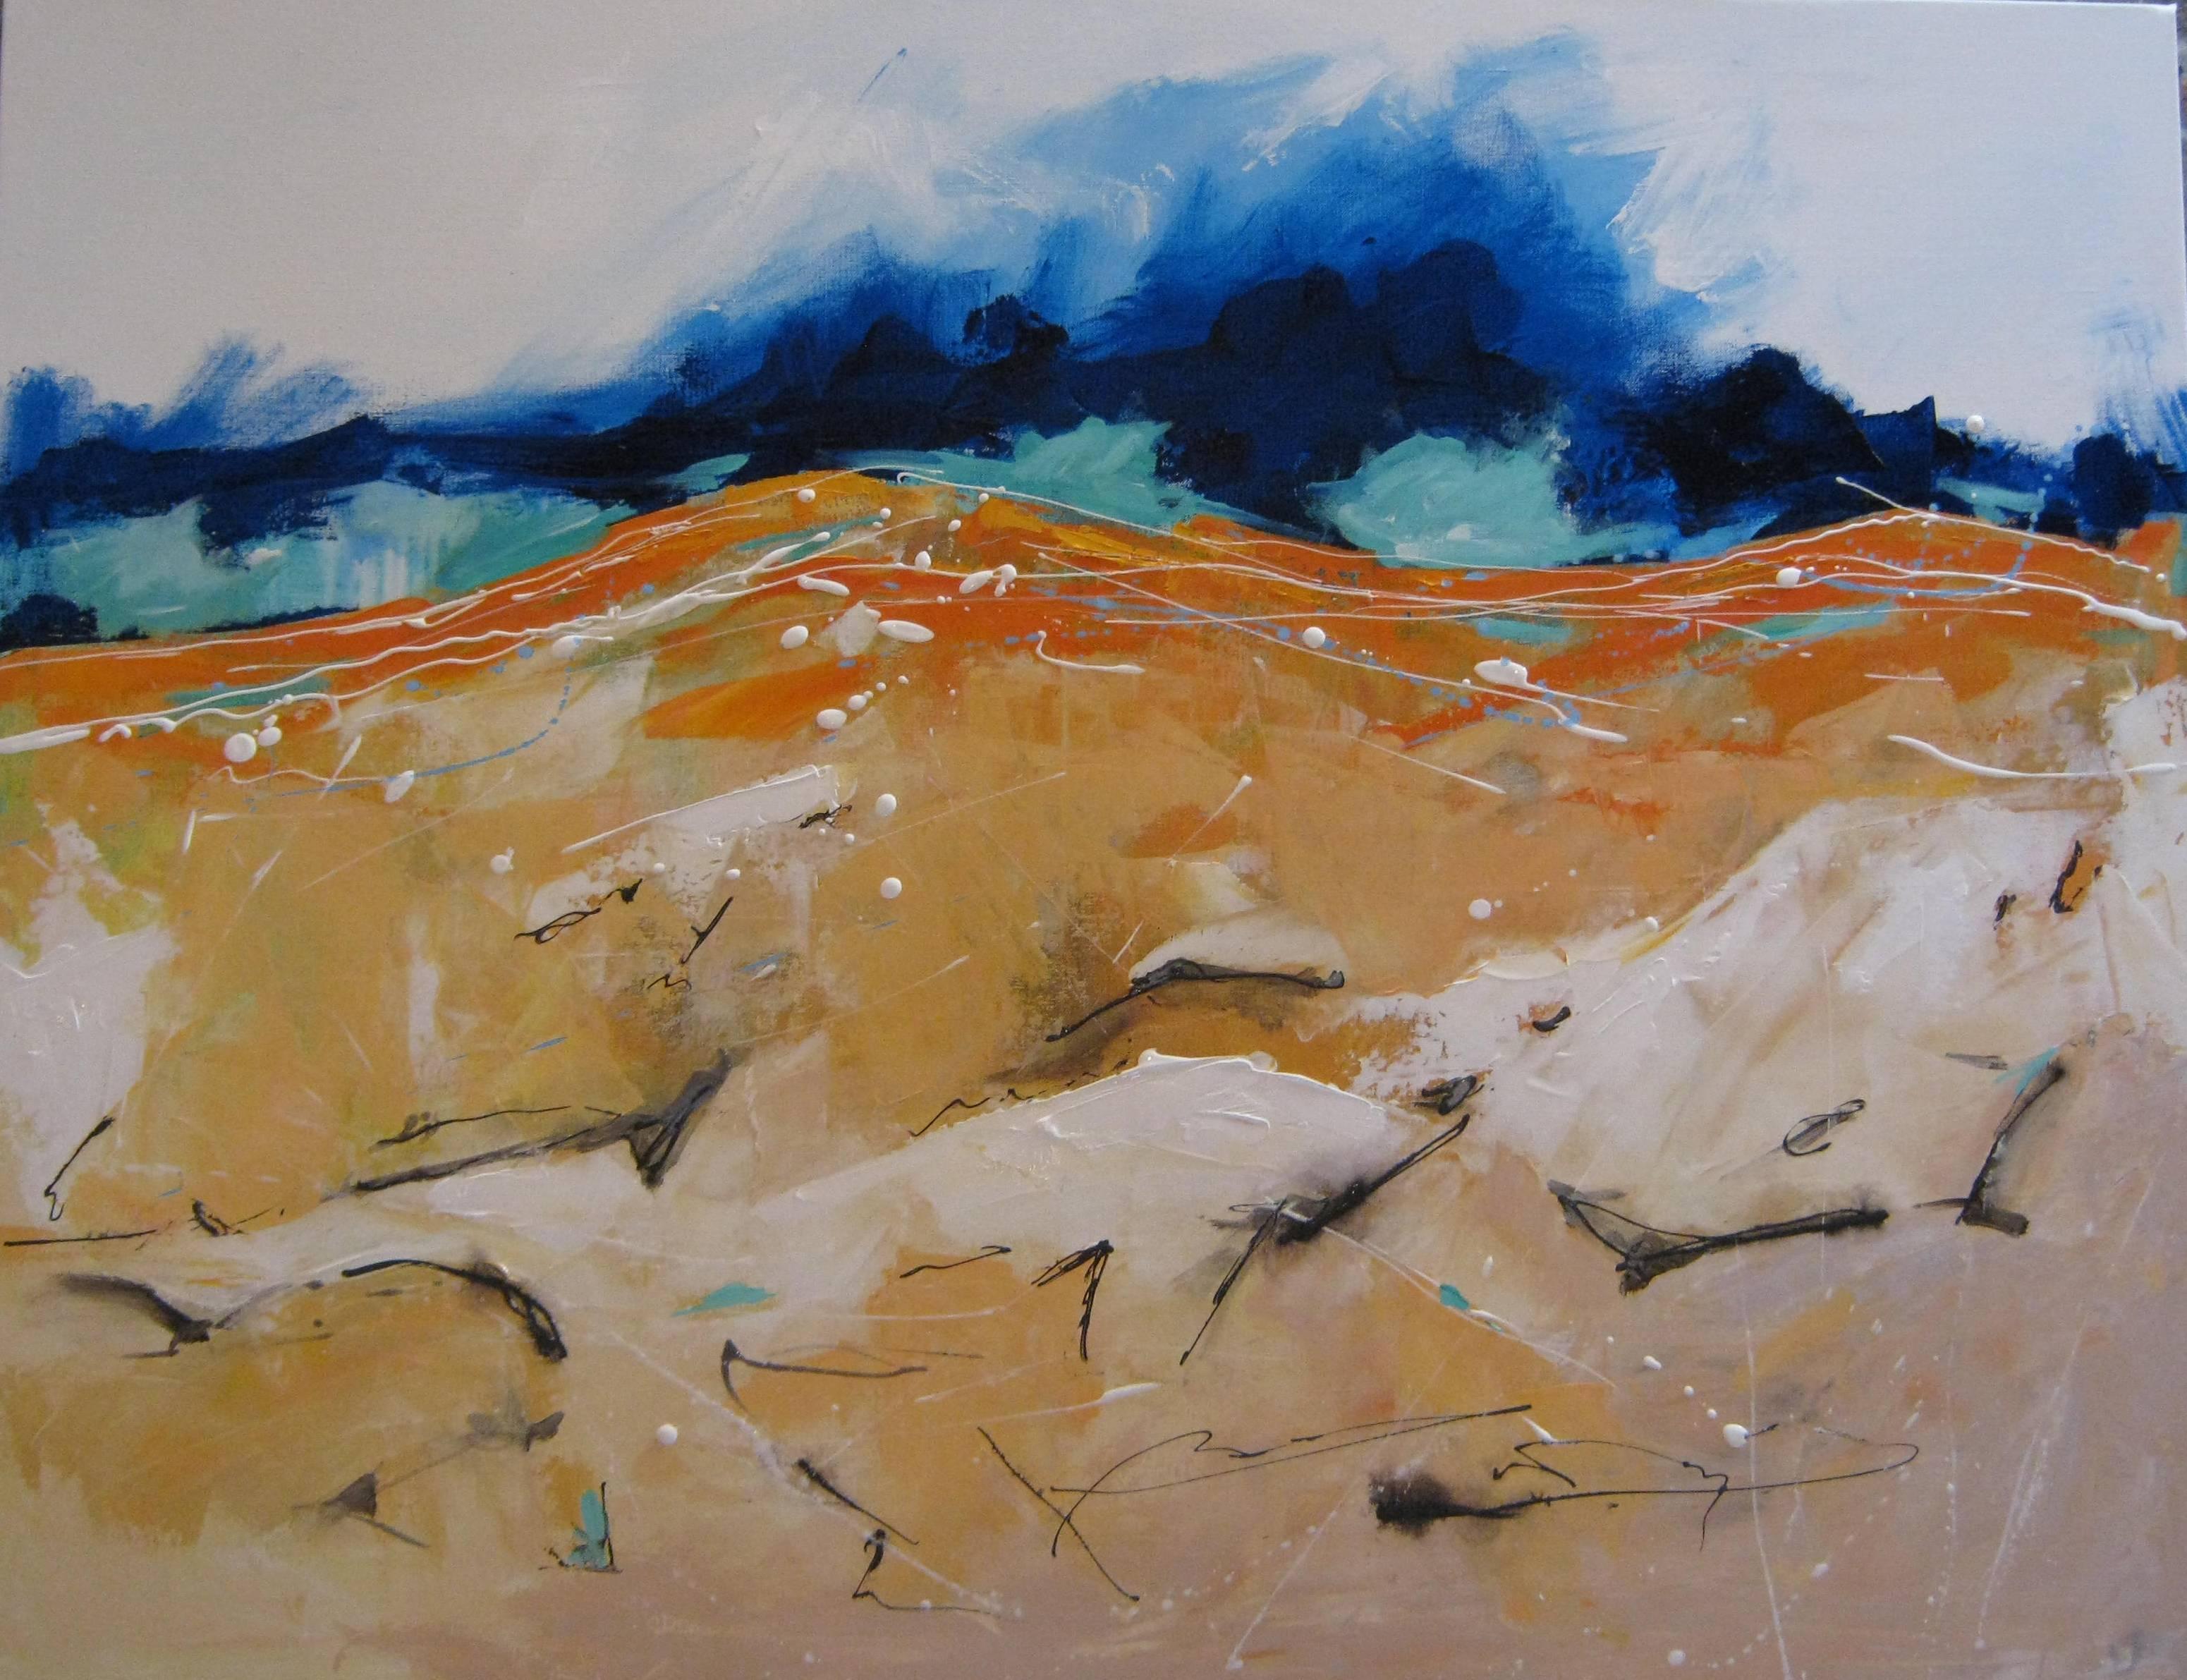 PAINTING BY GEORGE HAYWARD KALAMUNDA WESTERN AUSTRALIA LAND OF CONTRASTS